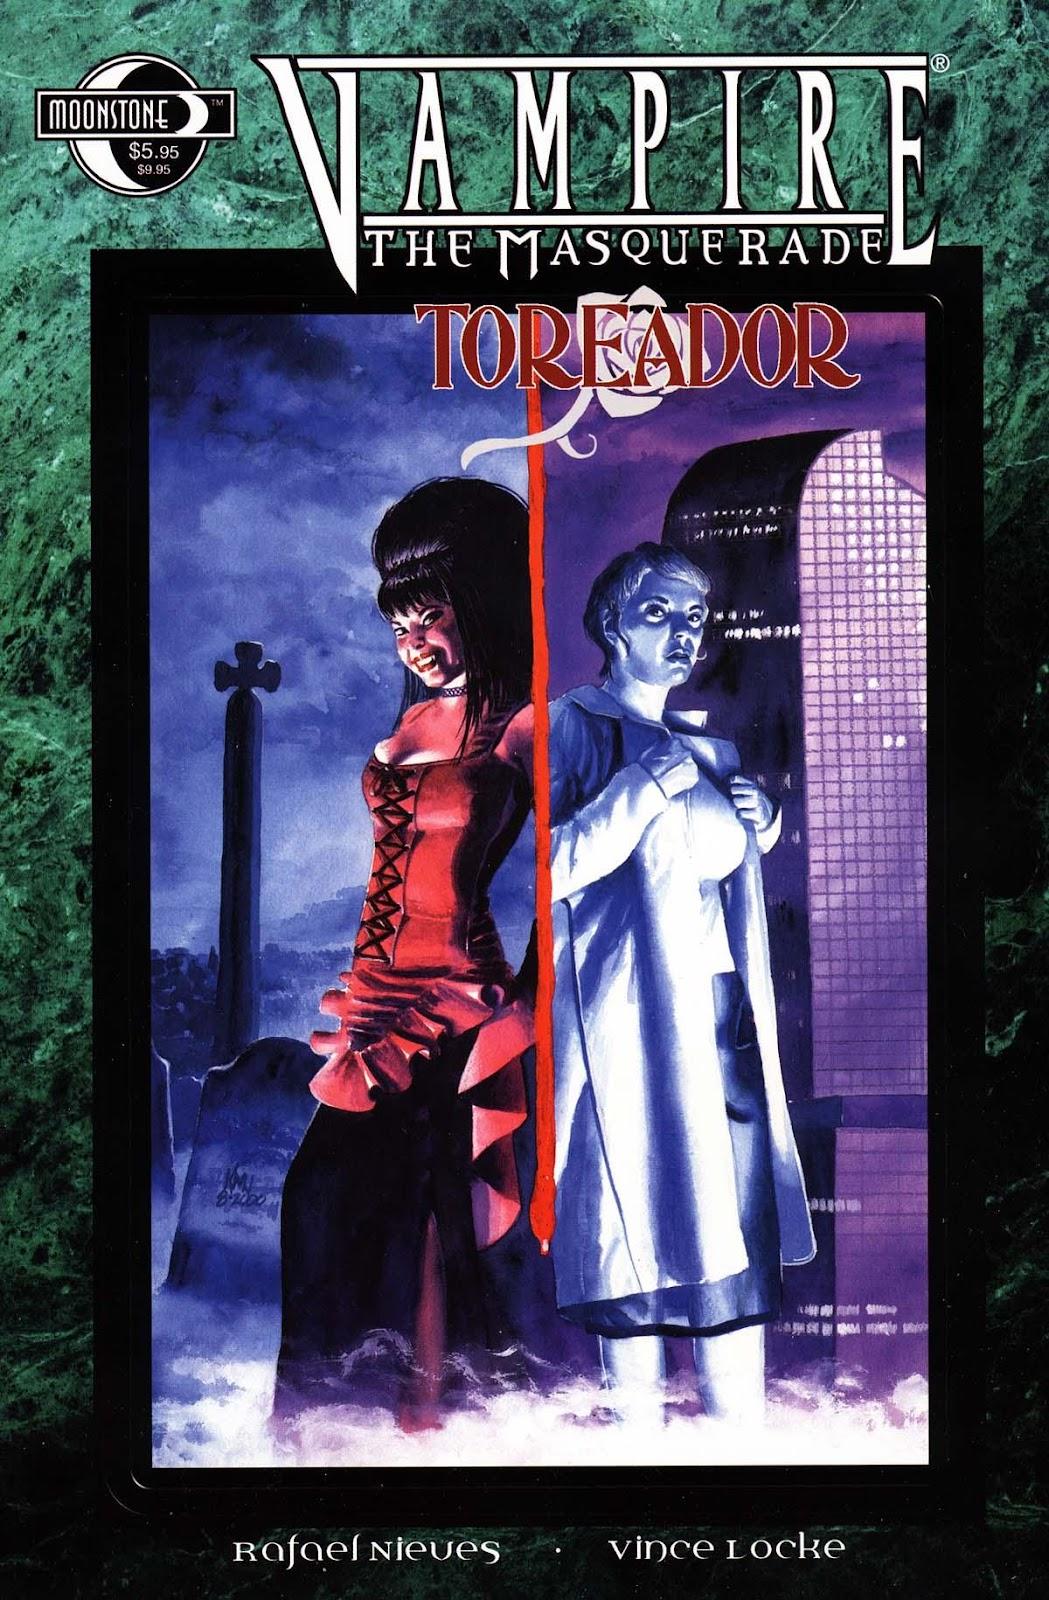 Read online Vampire the Masquerade comic -  Issue # Toreador - 1